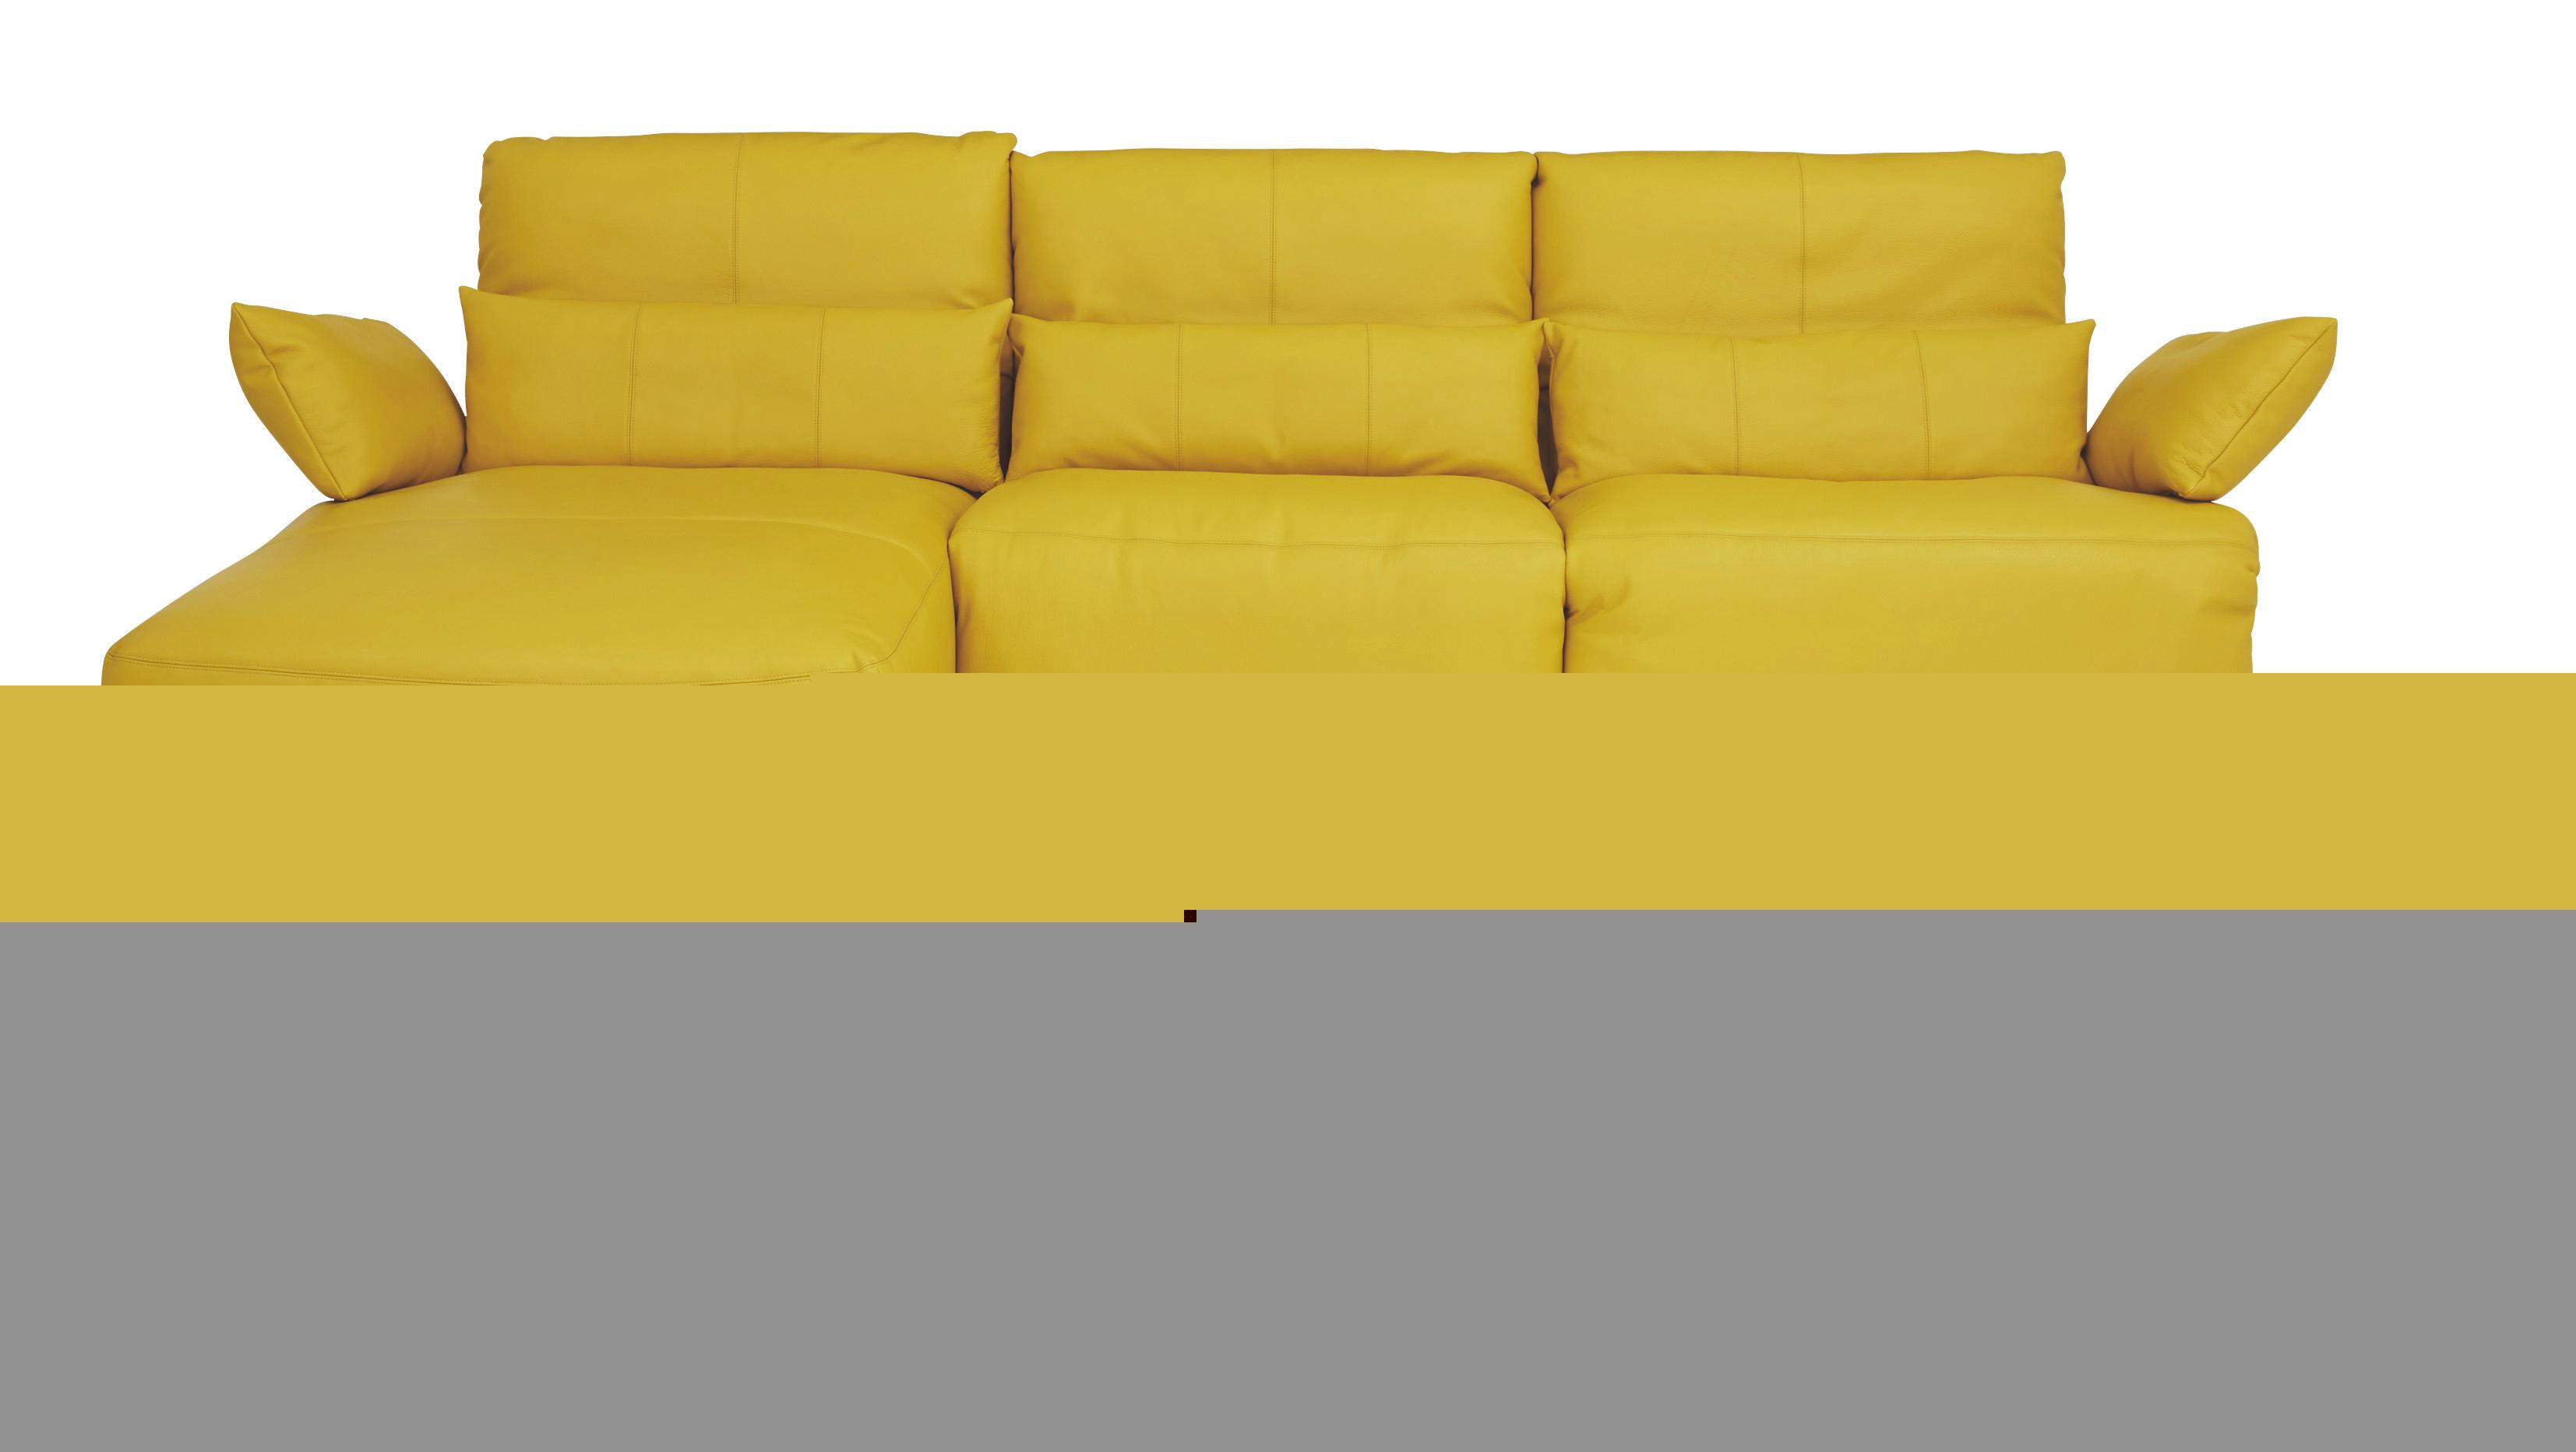 WOHNLANDSCHAFT Echtleder Nierenkissen - Gelb/Schwarz, Design, Leder/Kunststoff (170/300cm) - KOINOR